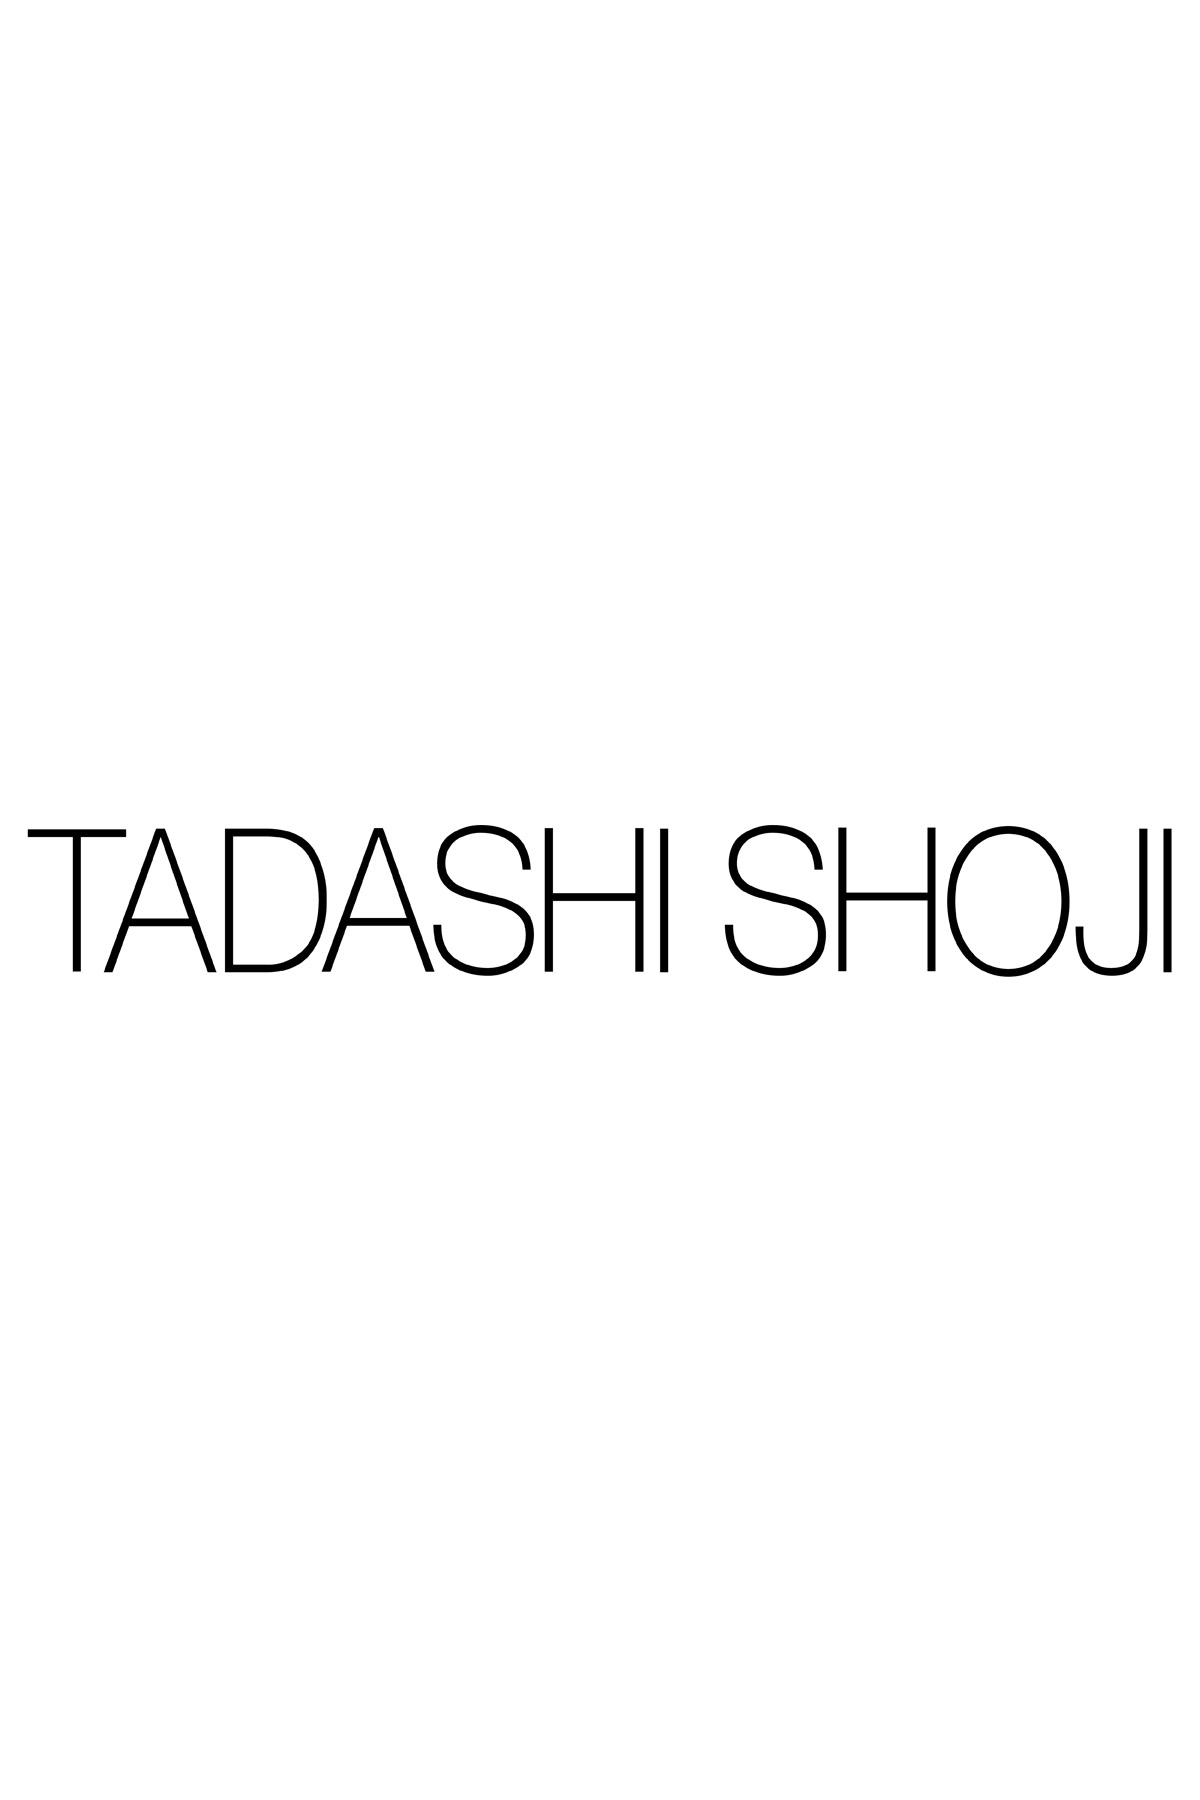 2be720f9d845 Women's Plus Size Evening Gowns & Formal Dresses   Tadashi Shoji